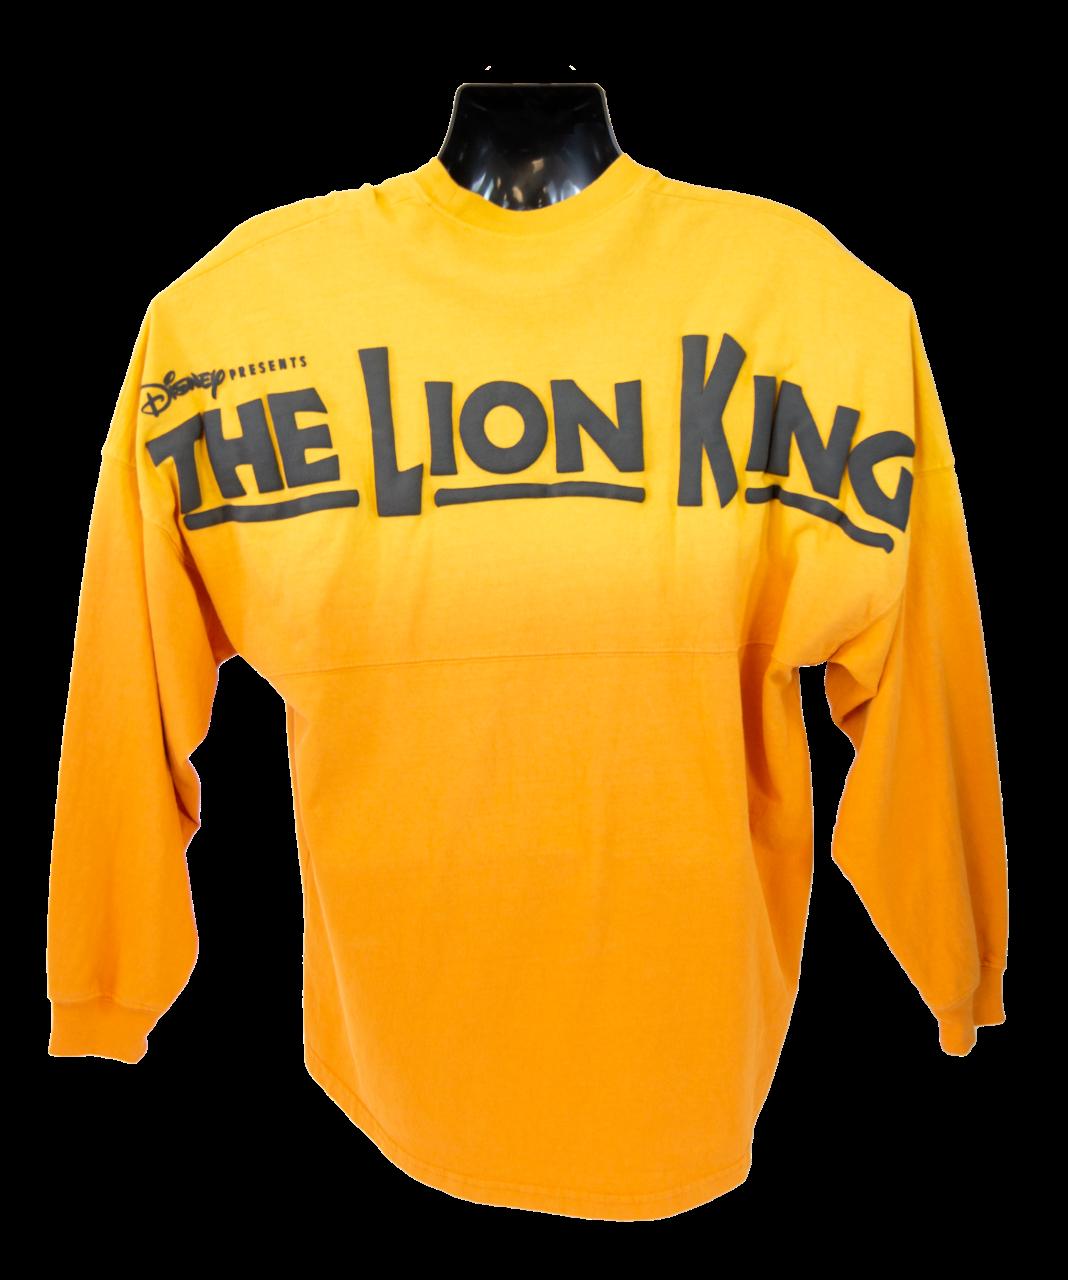 Lion King symbol embroidered spirit jersey